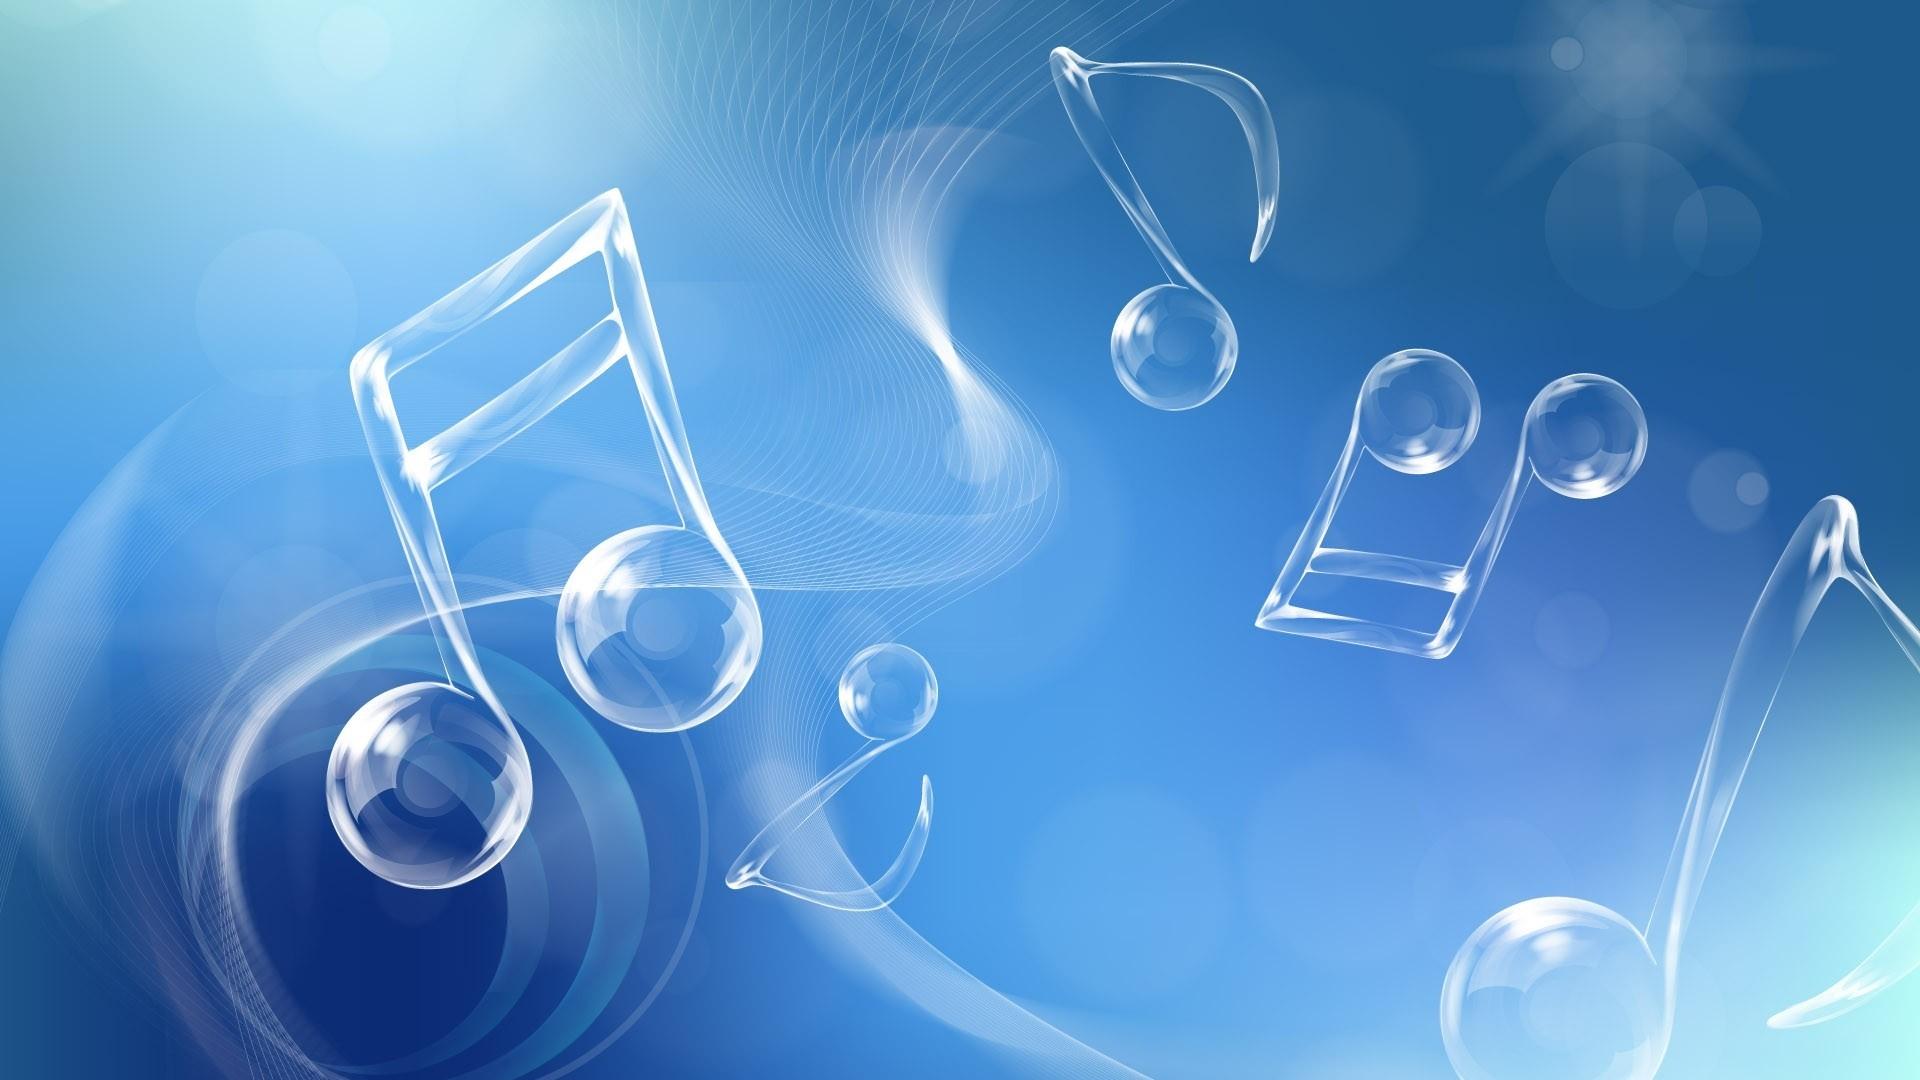 blue, white, music